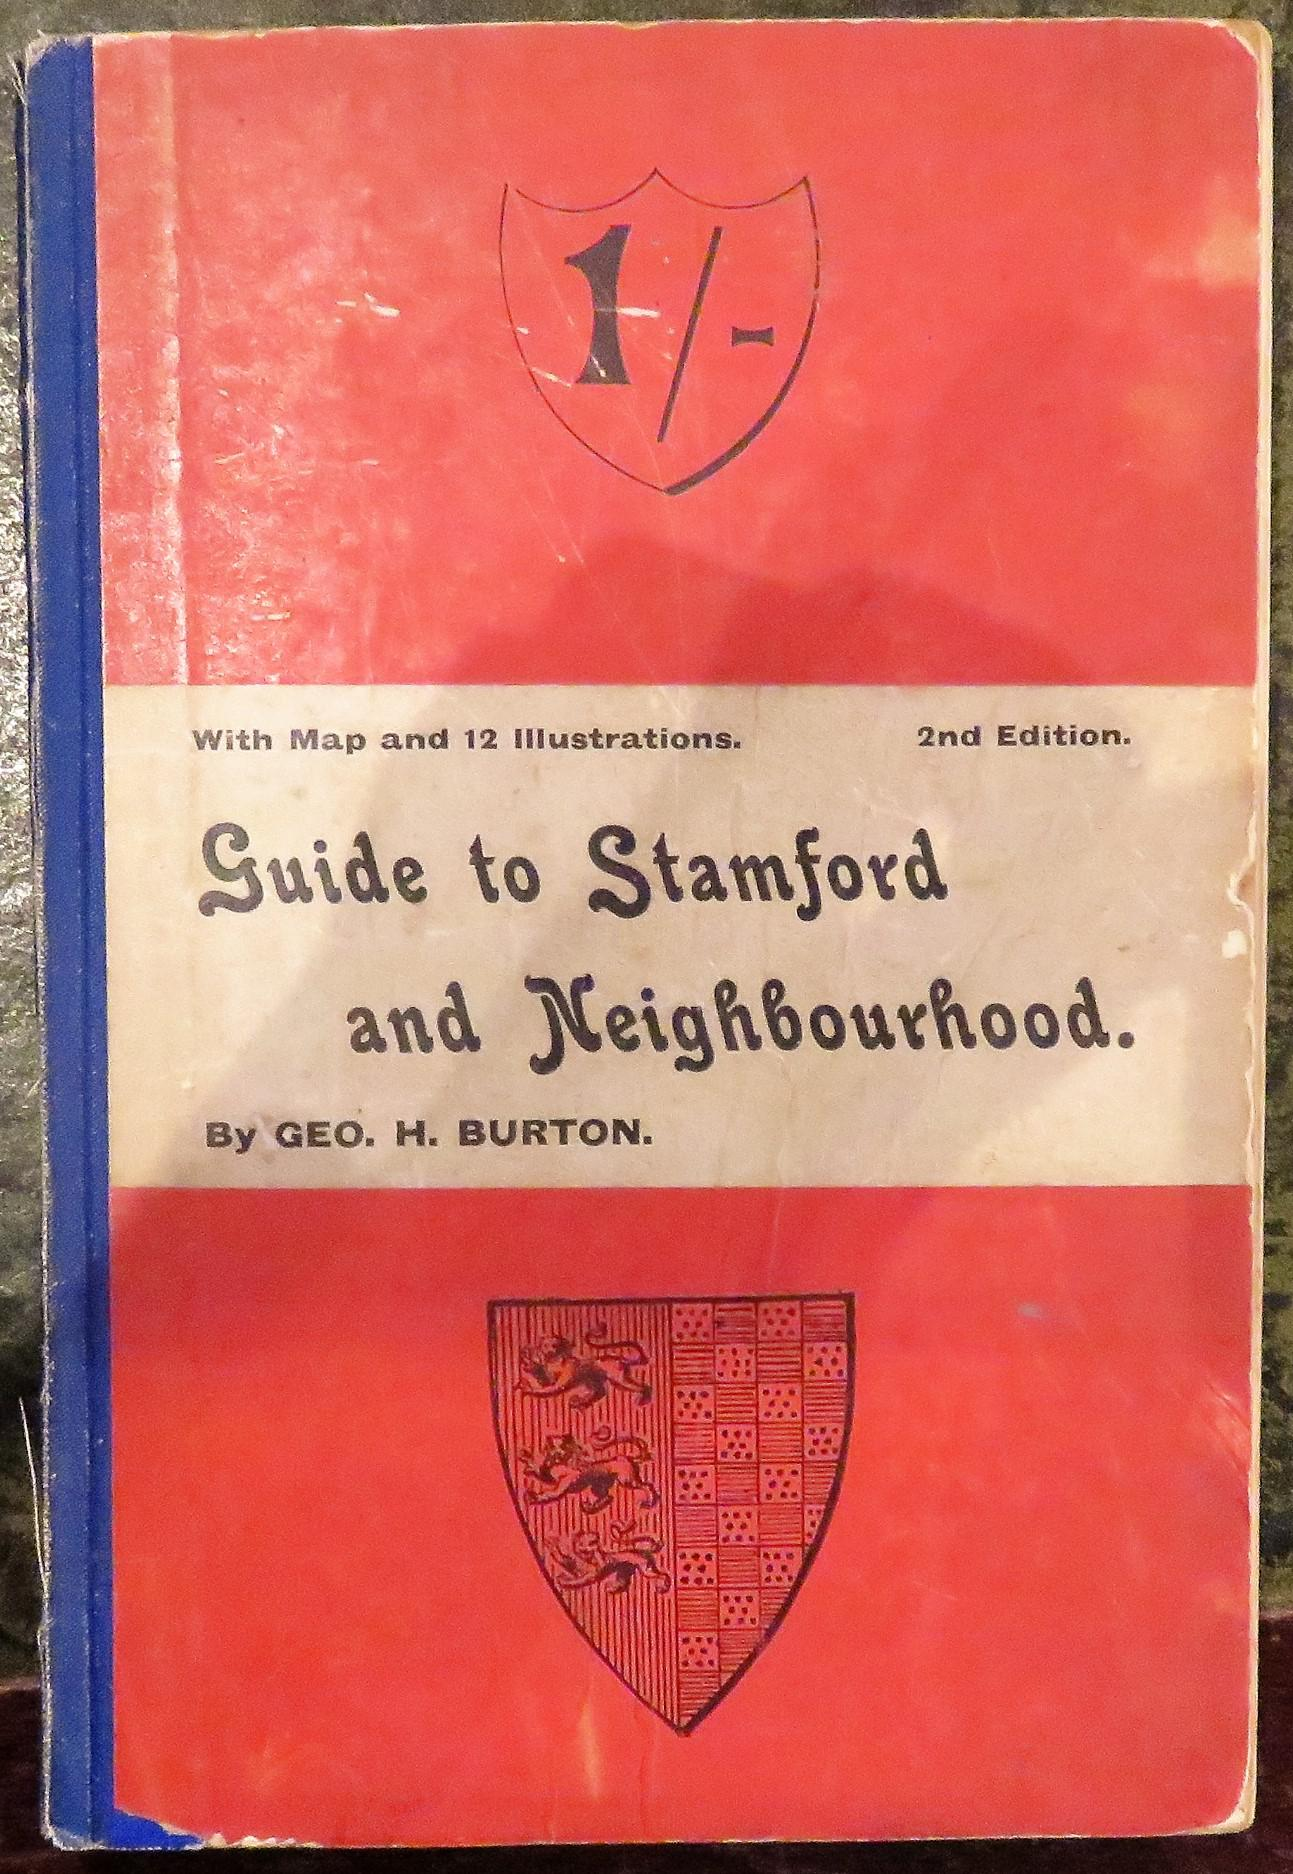 Guide to Stamford and Neighbourhood